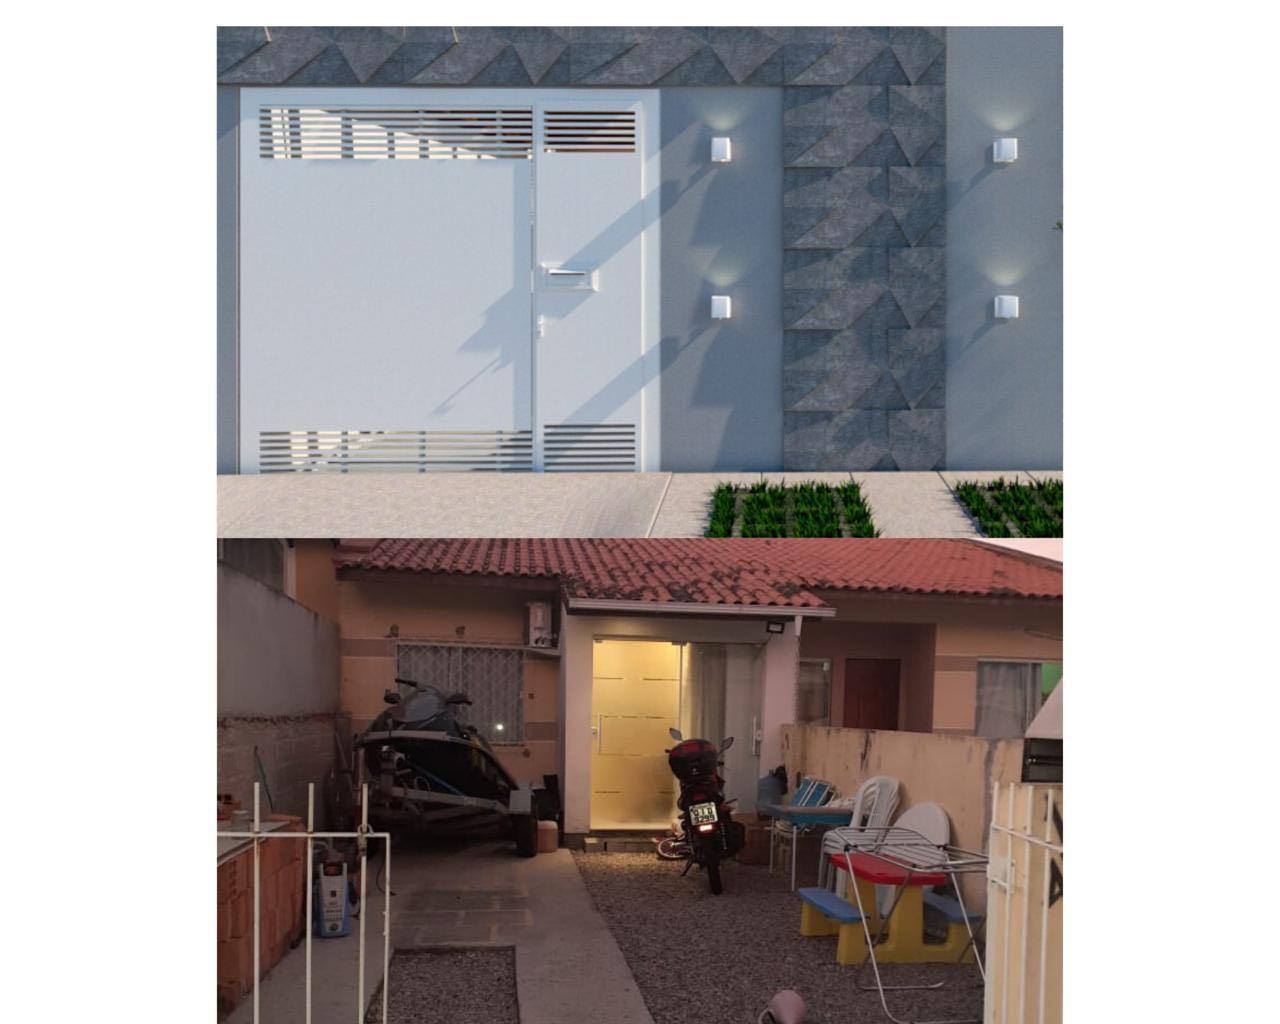 Fachada antes e depois